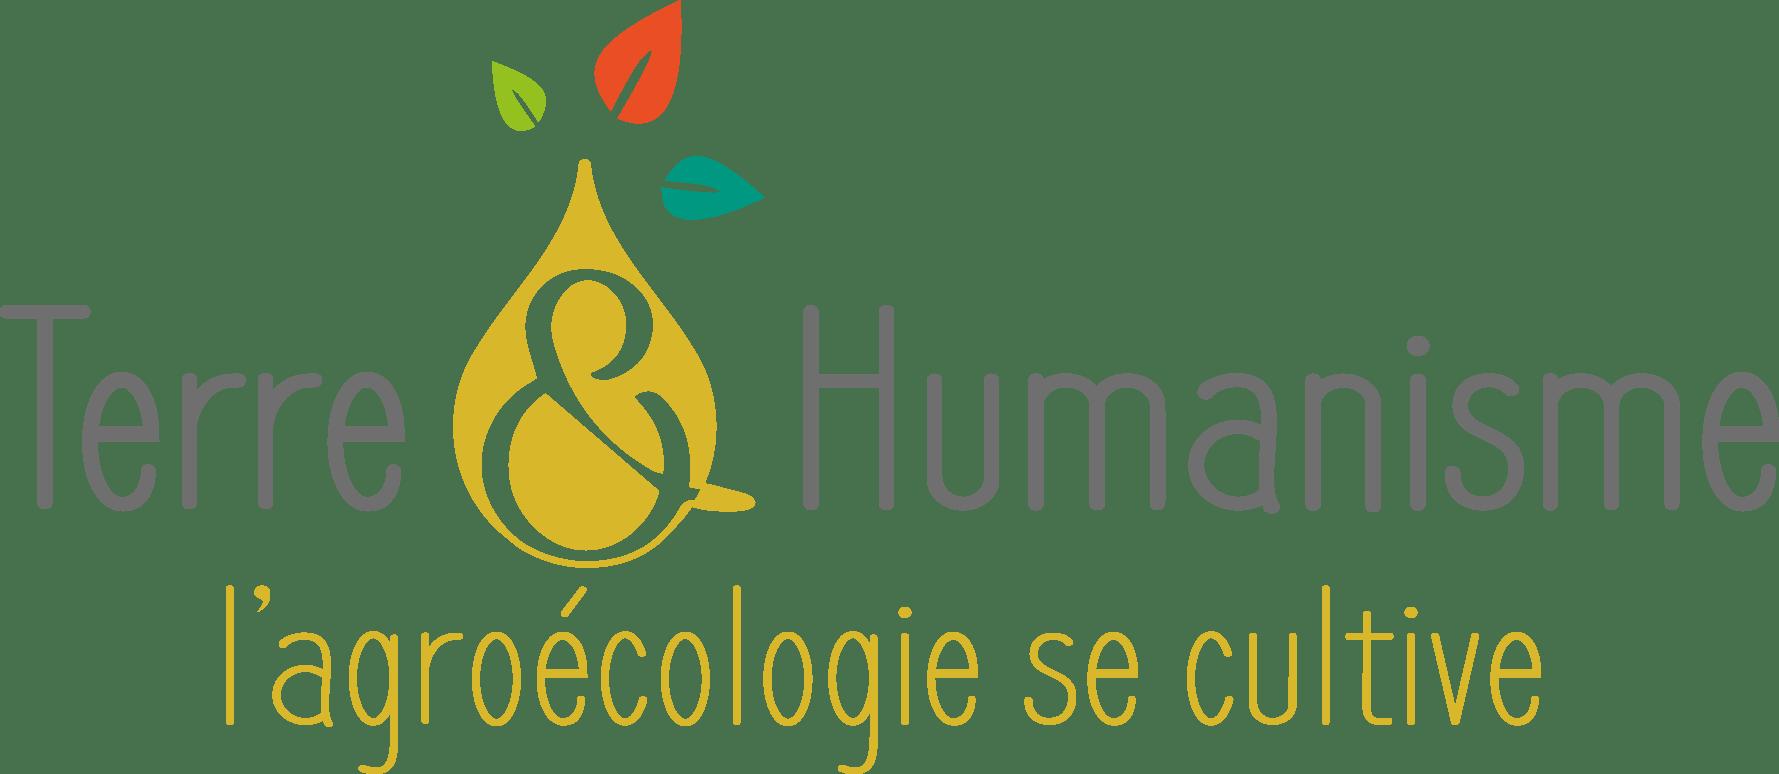 Terre&Humanisme logo